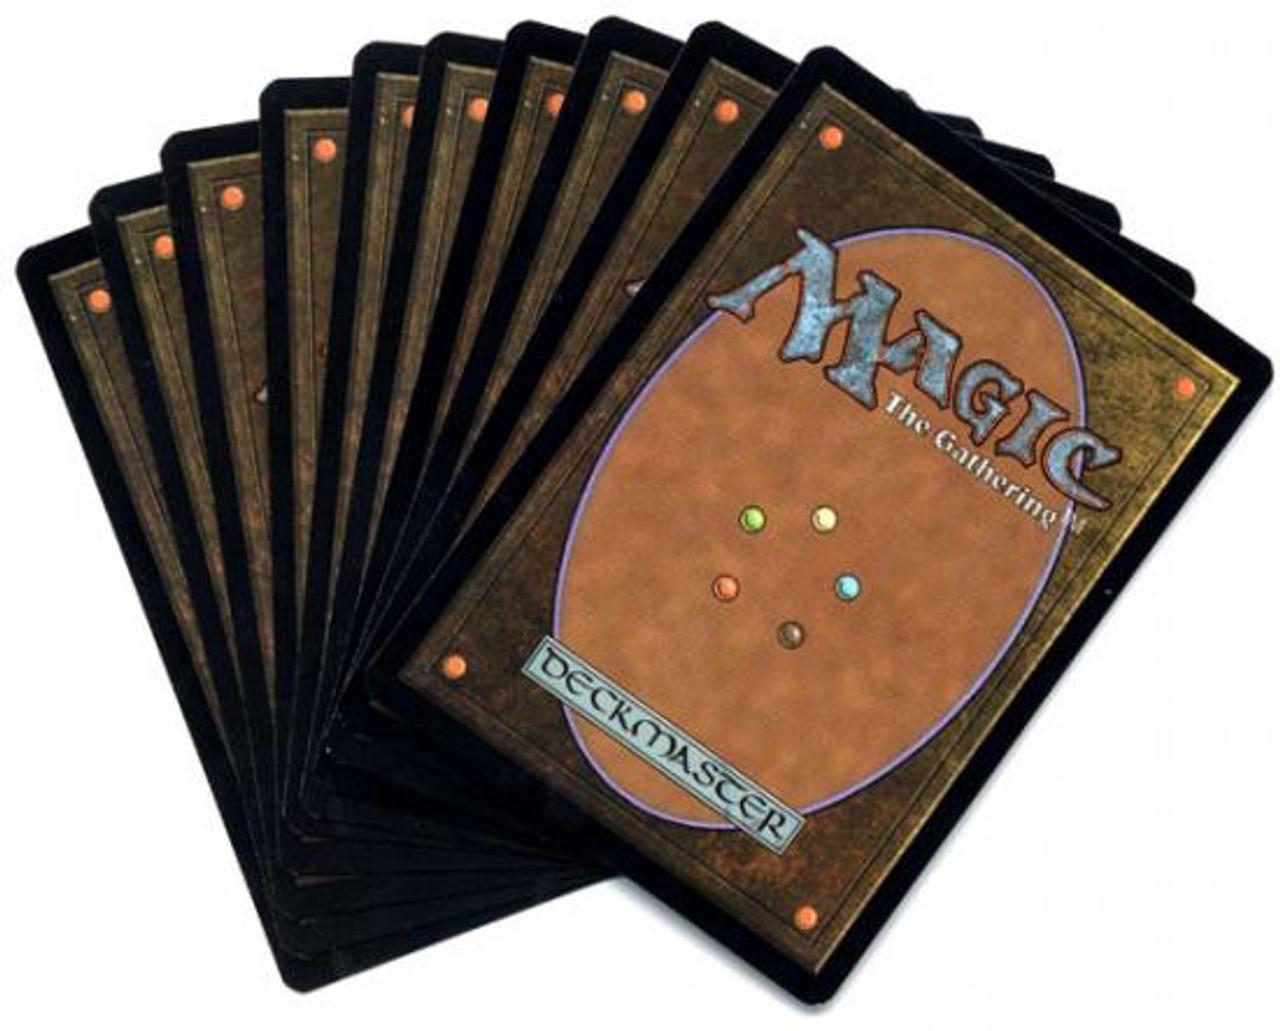 MtG Lot of 10 Random Rare Artifact Rare Single Cards